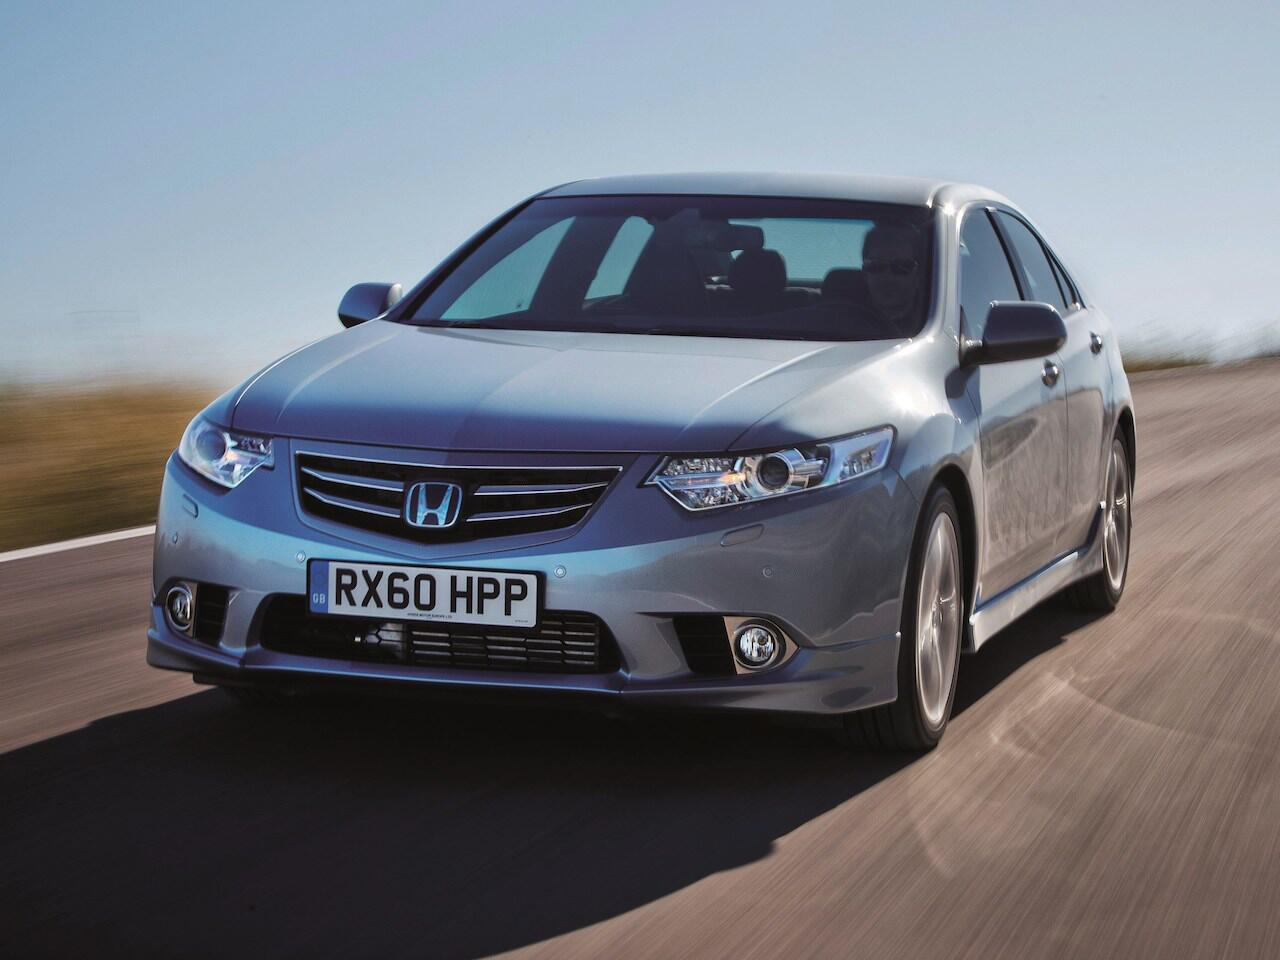 Bild zu Platz 4: Honda Accord